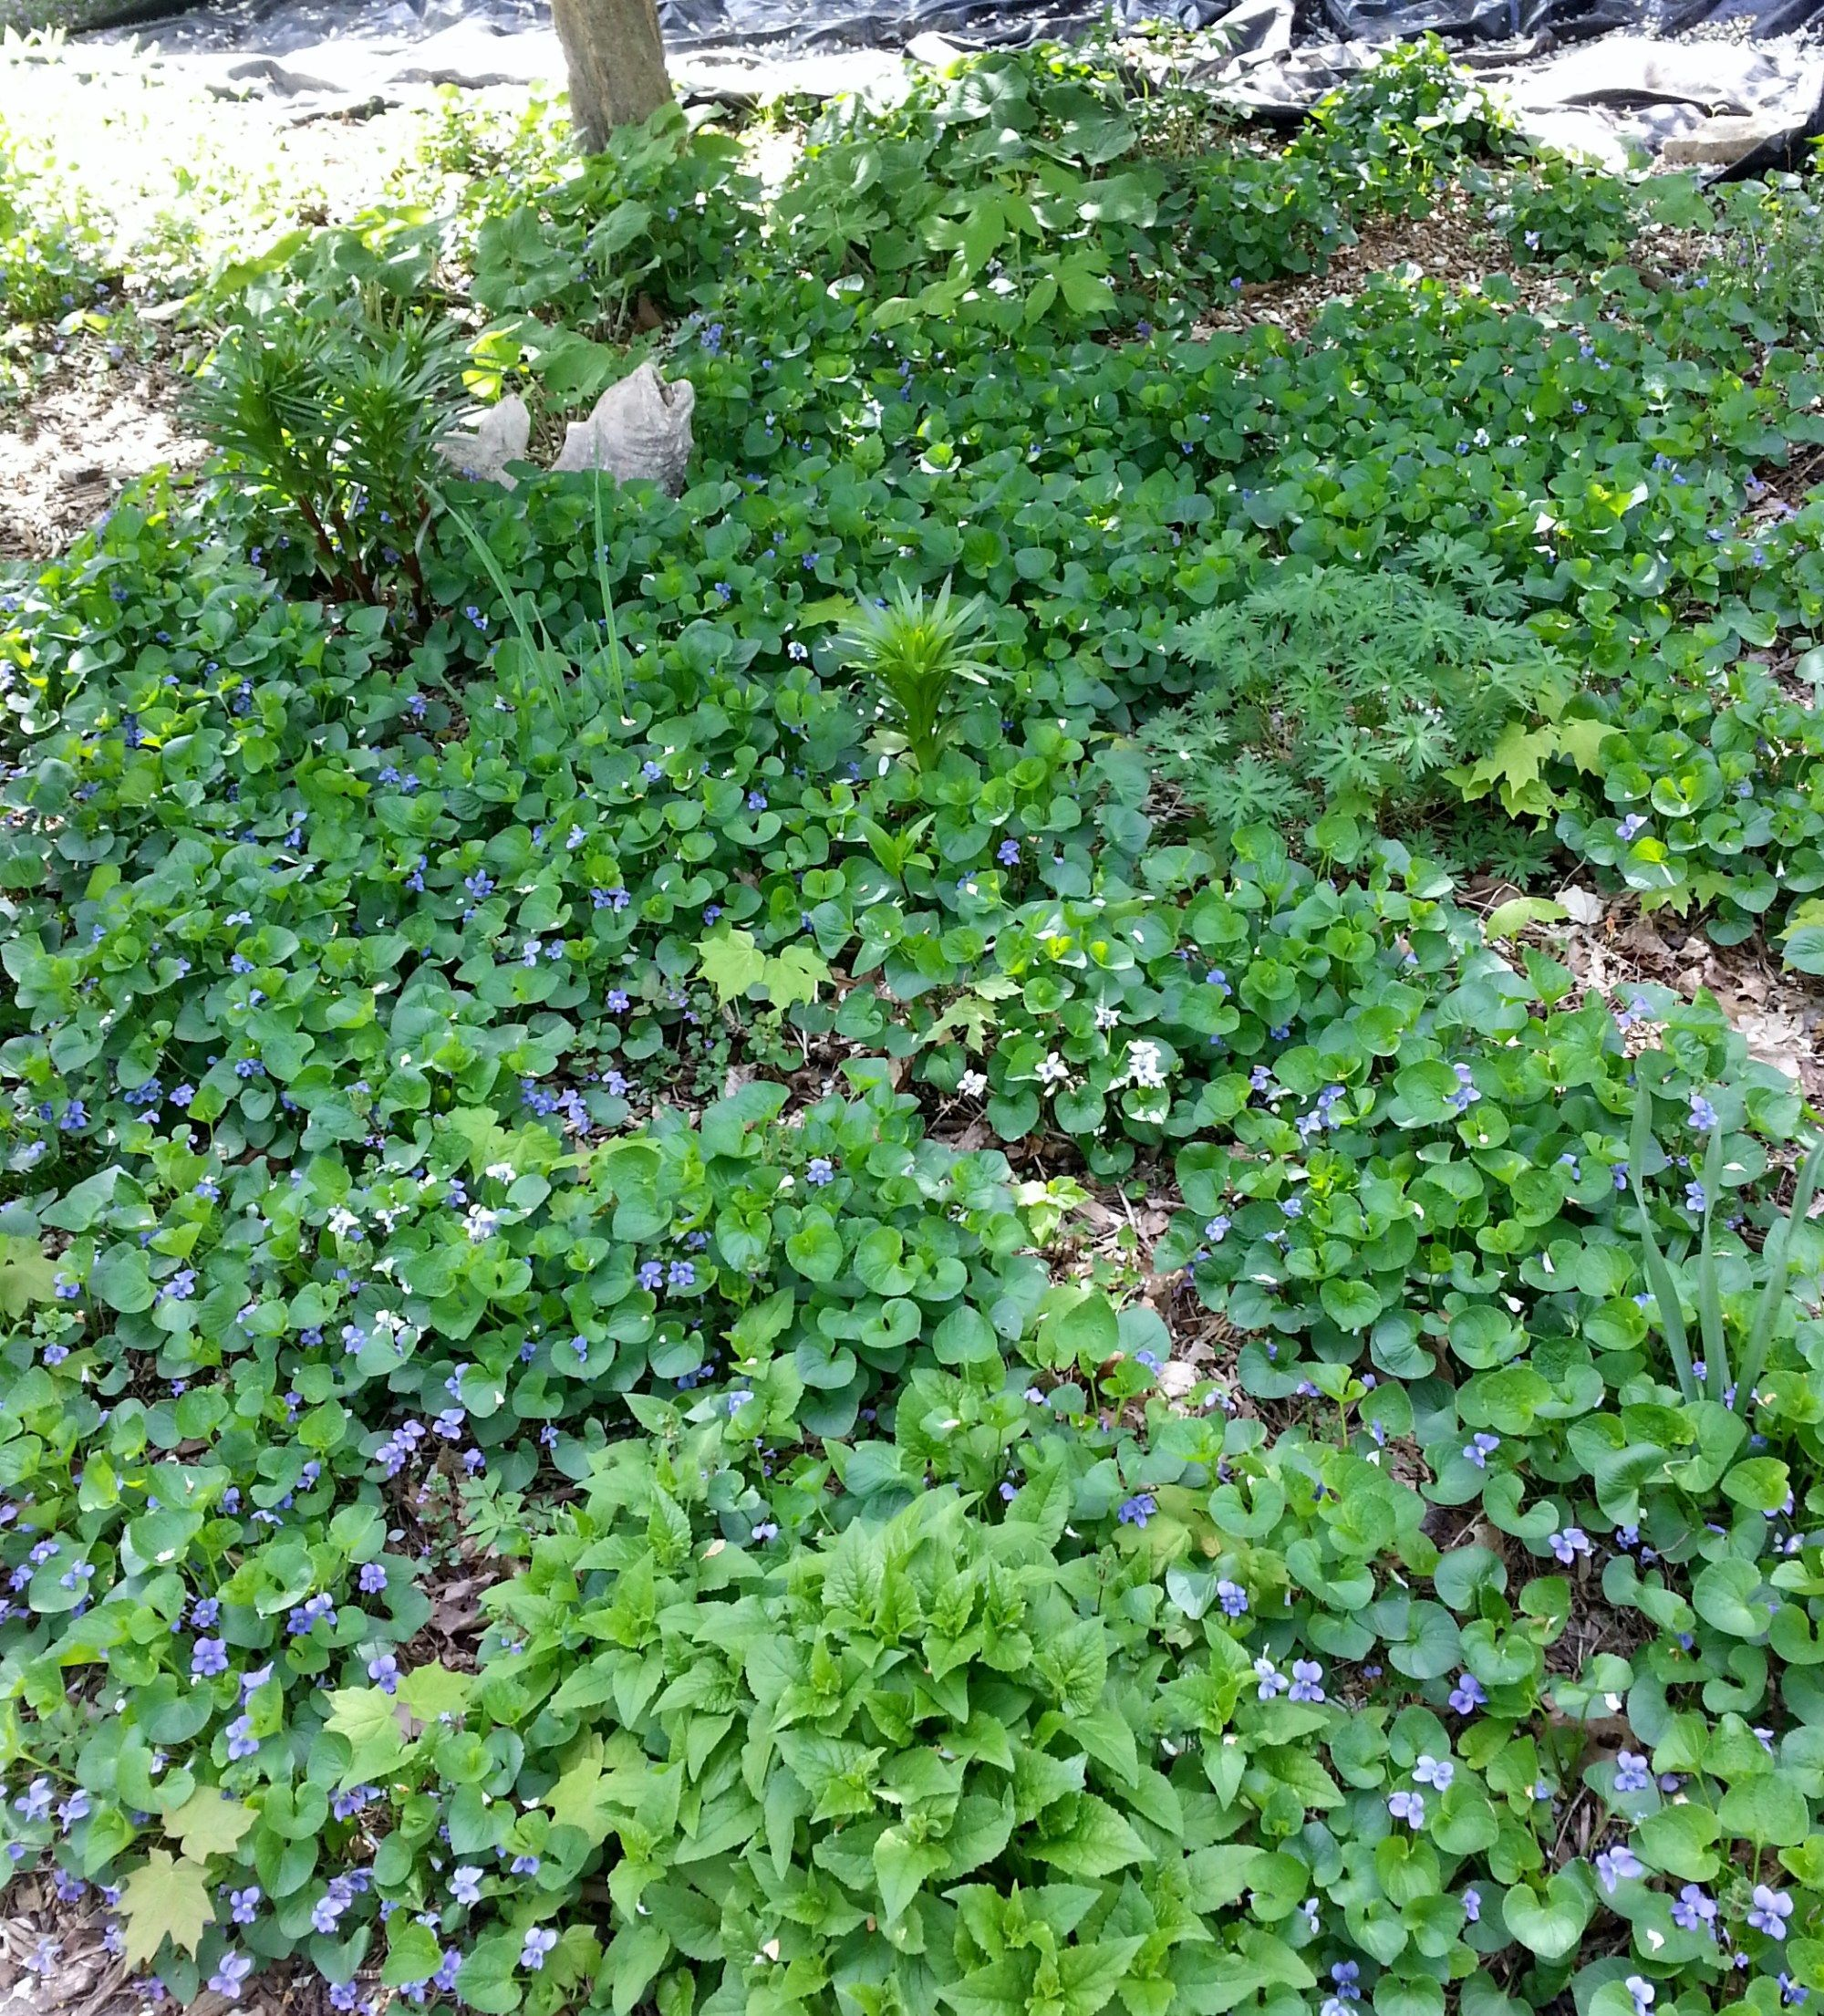 Canut beat uem eat uem edible weeds yards yard ideas and gardens